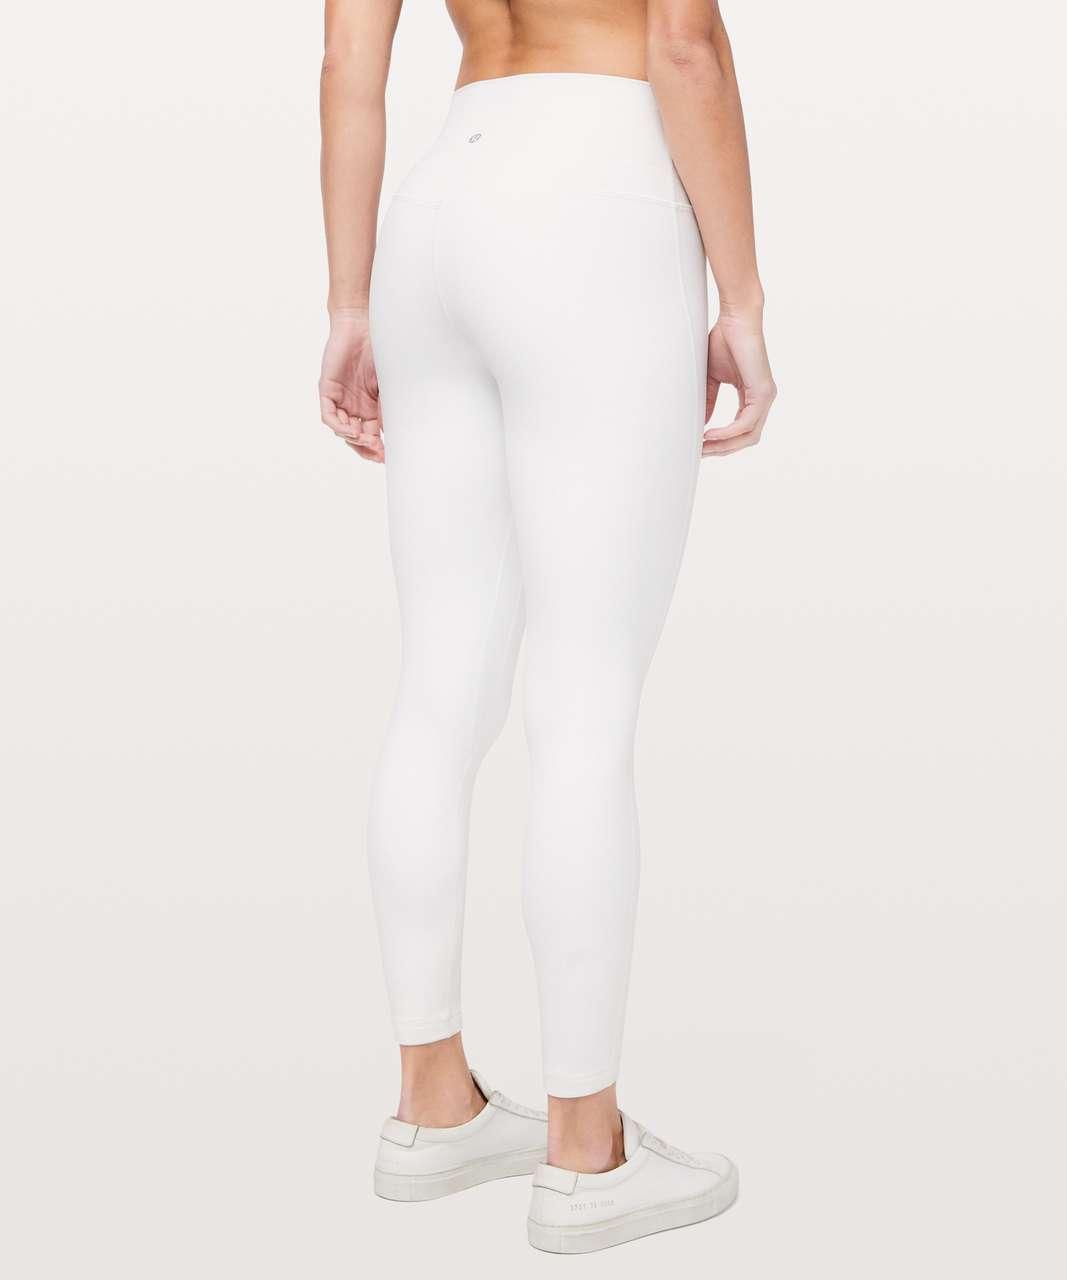 "Lululemon Align Pant II *25"" - White"